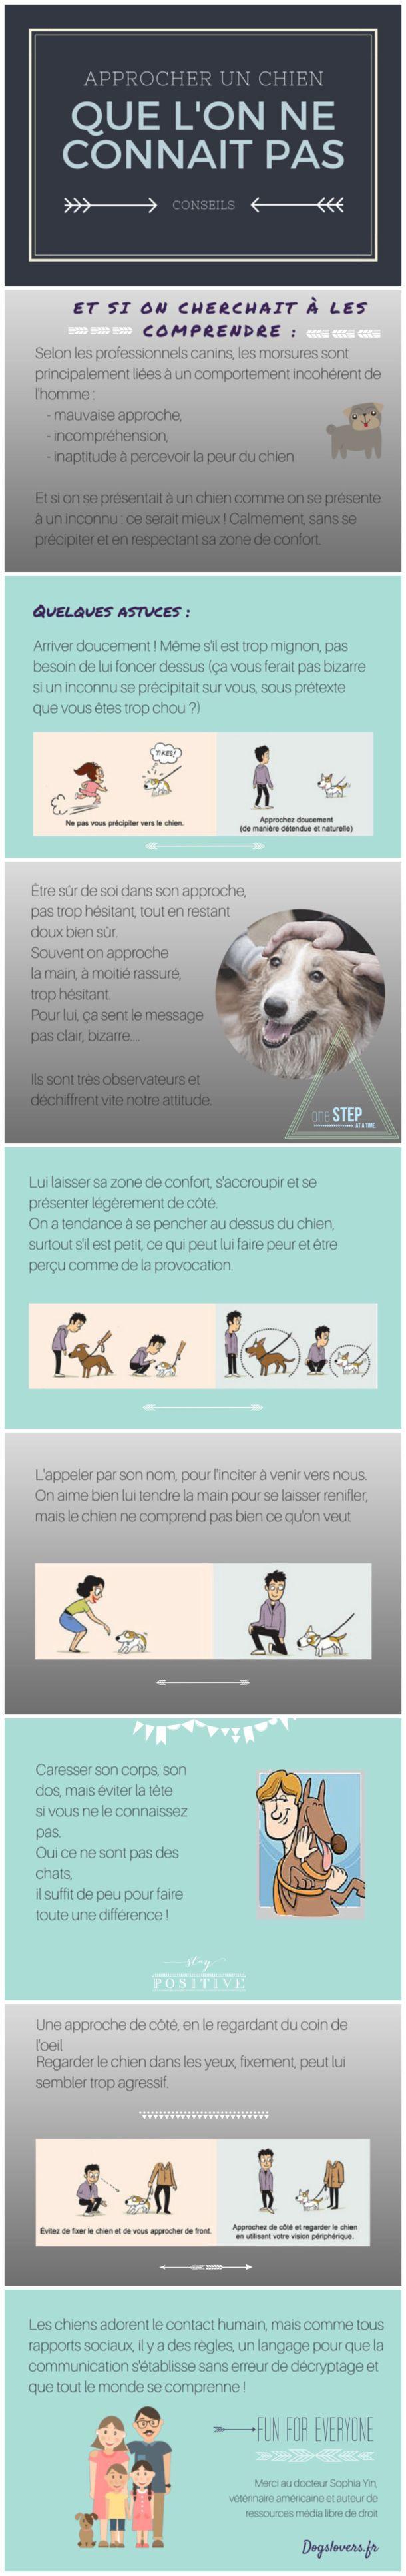 approcher un chien conseil langage canin